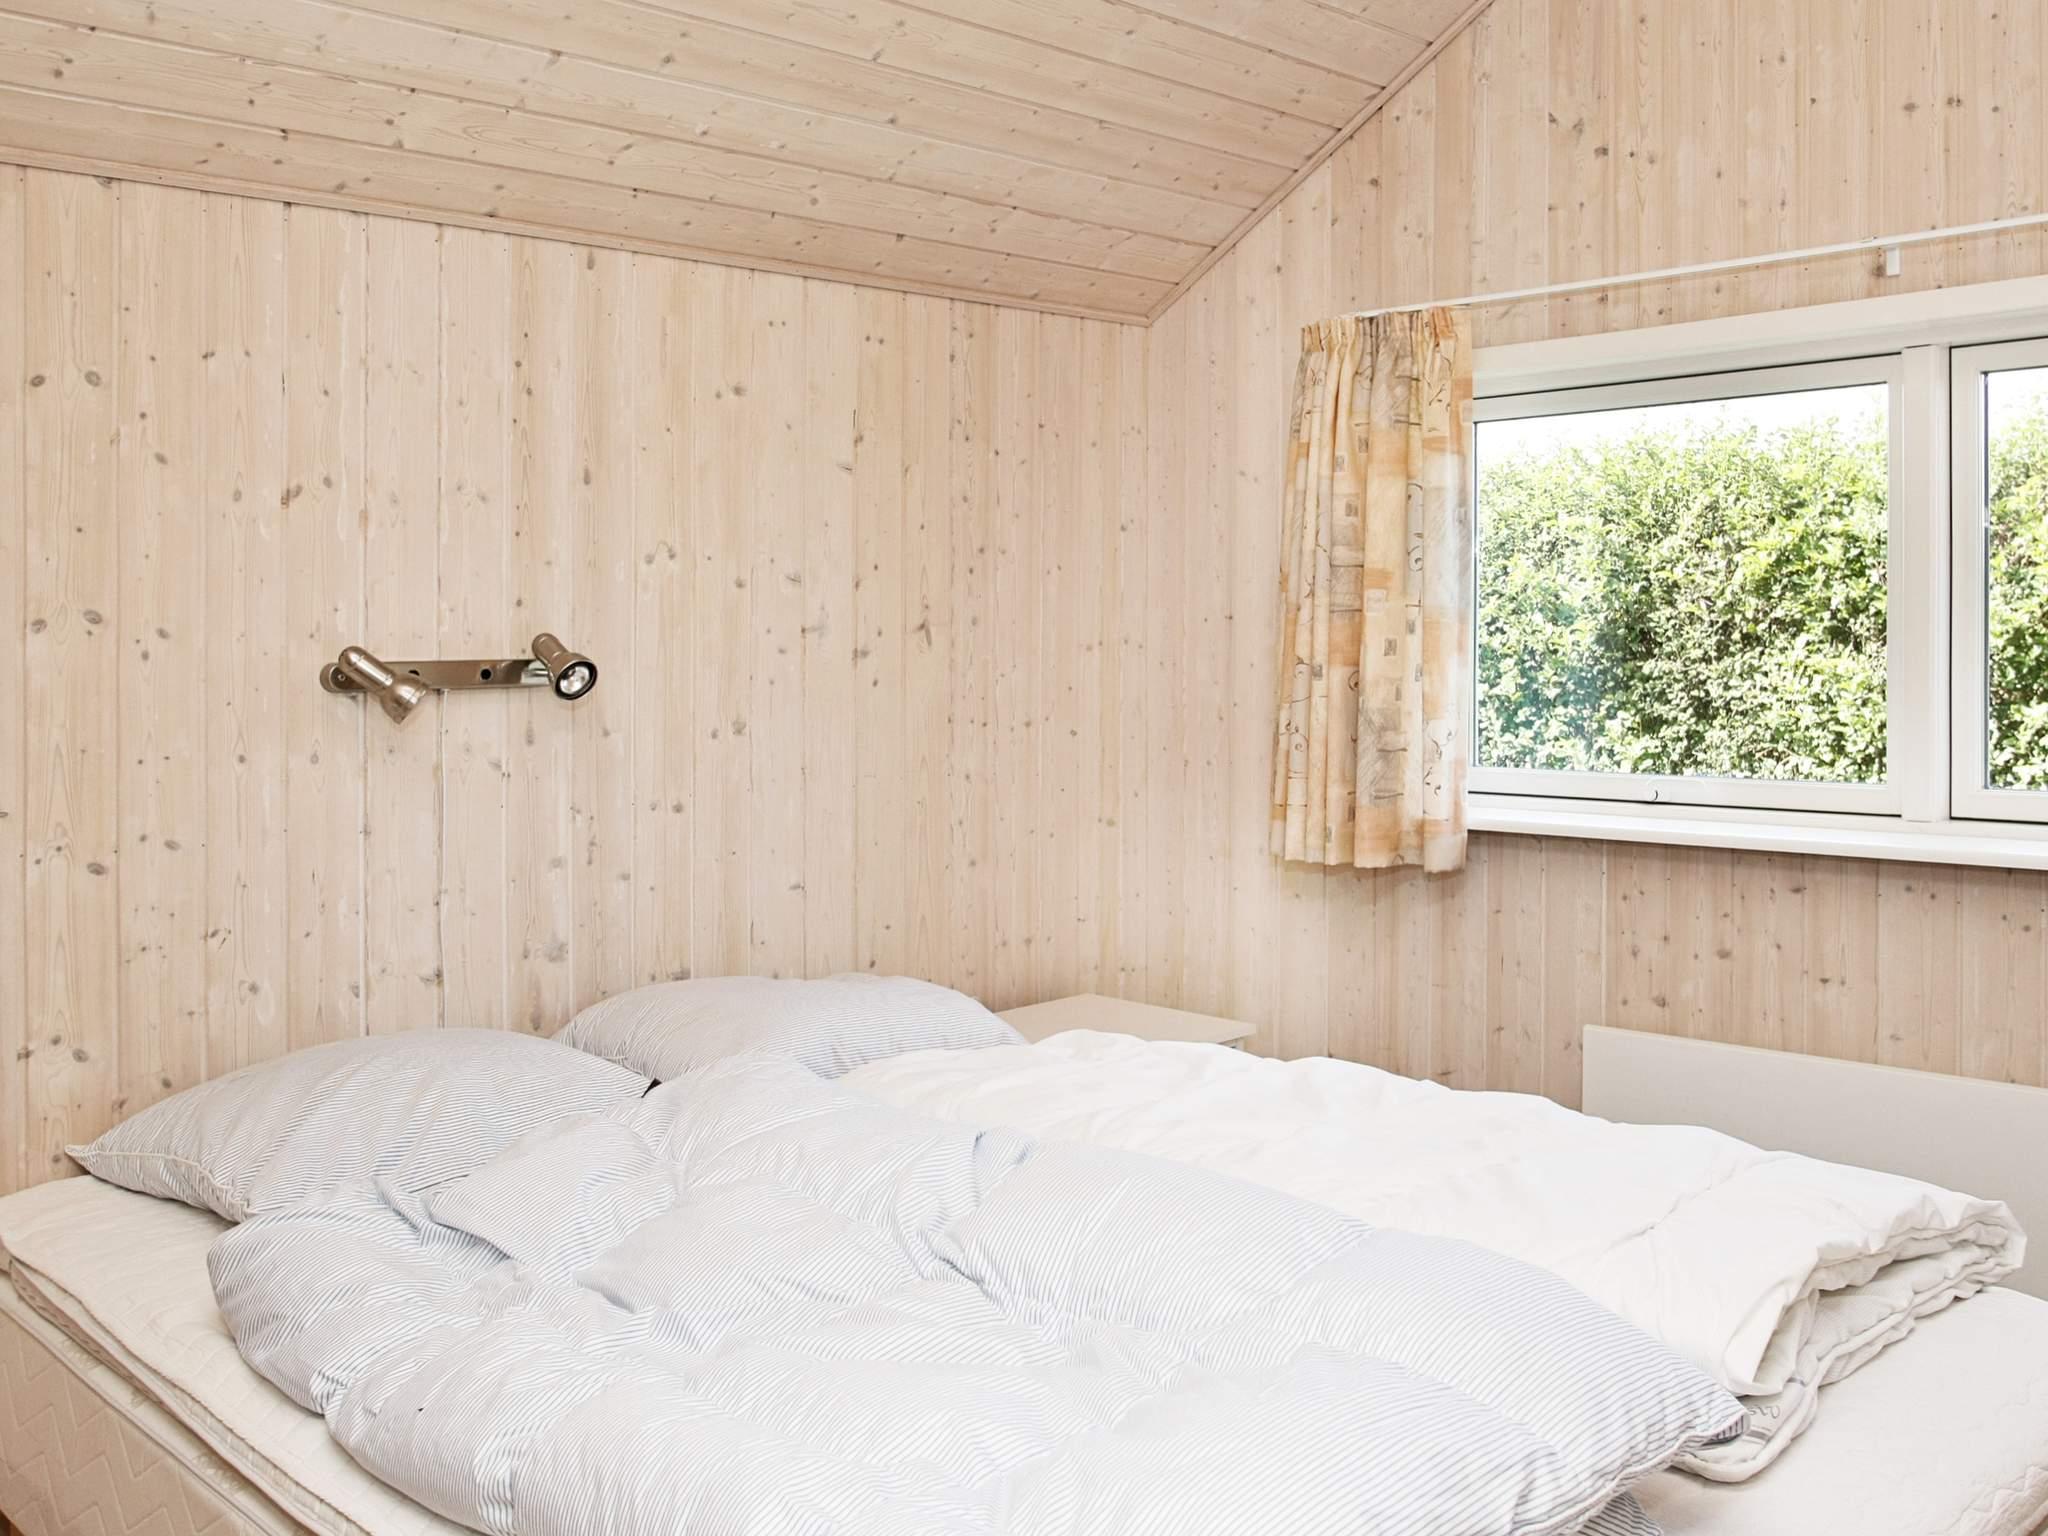 Maison de vacances Astrup Vig (407189), Roslev, , Limfjord, Danemark, image 5